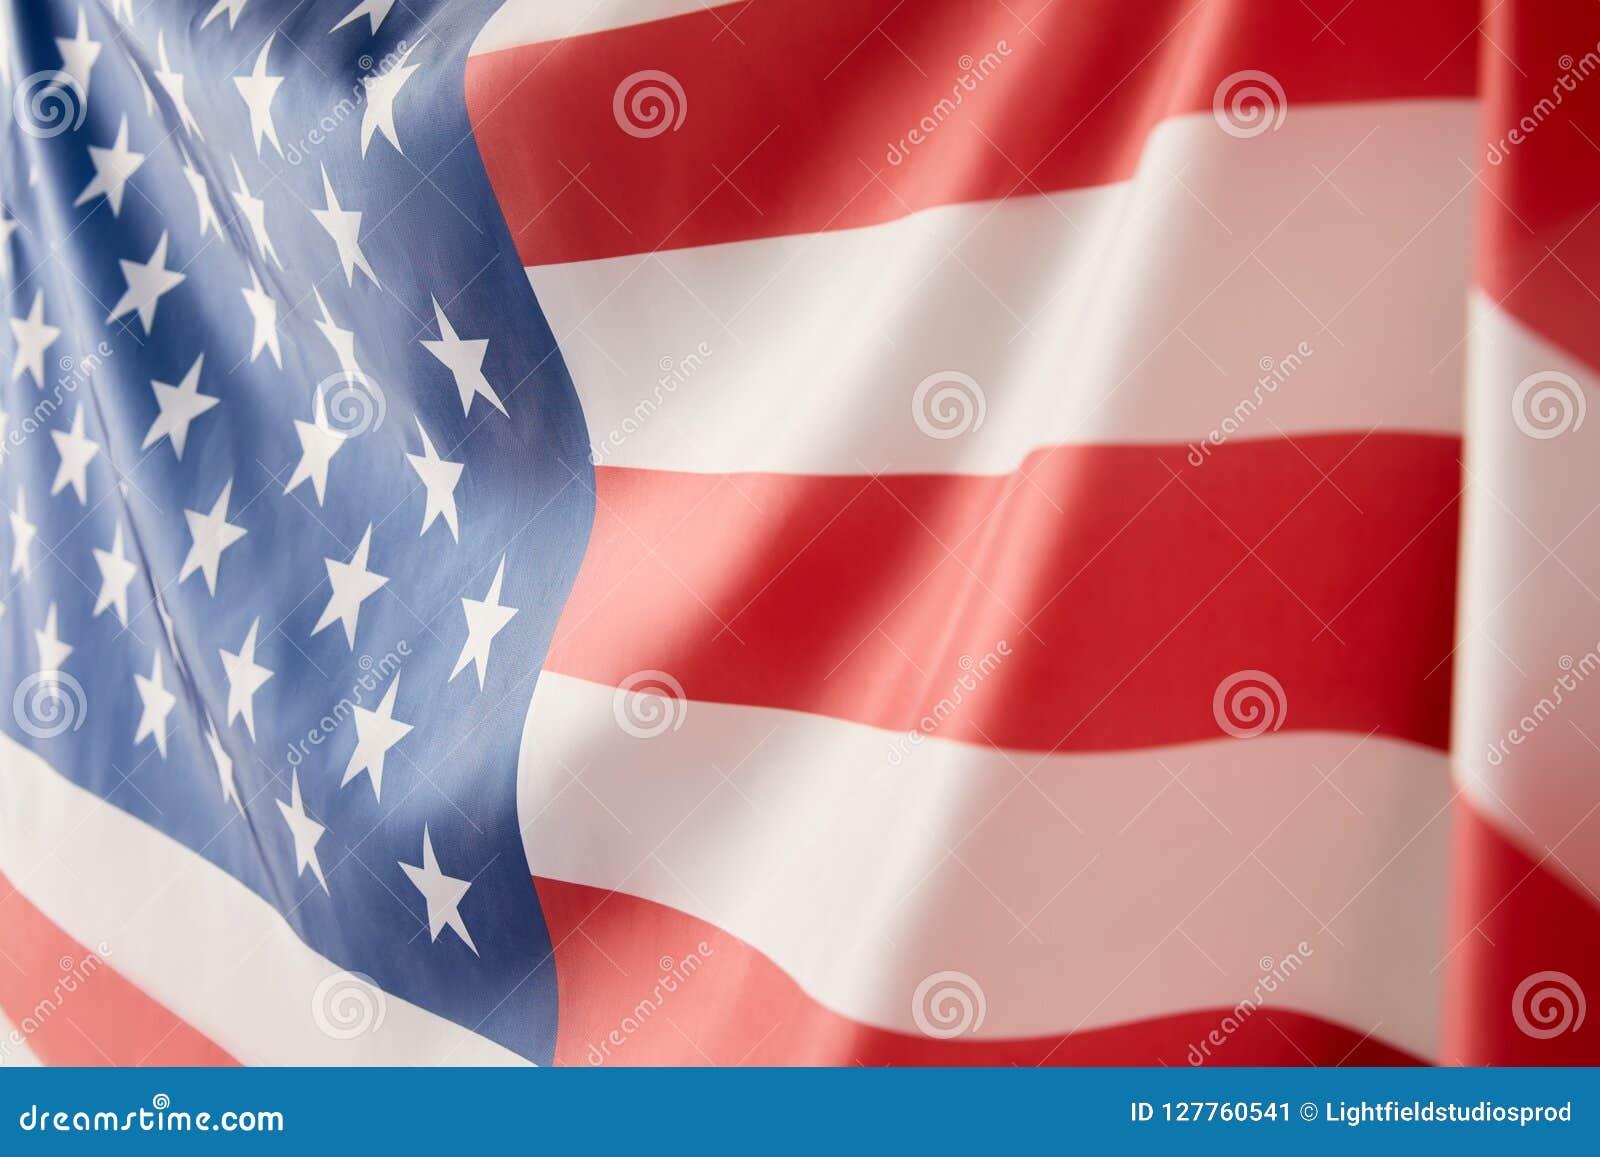 Feche acima da vista da bandeira de Estados Unidos da América